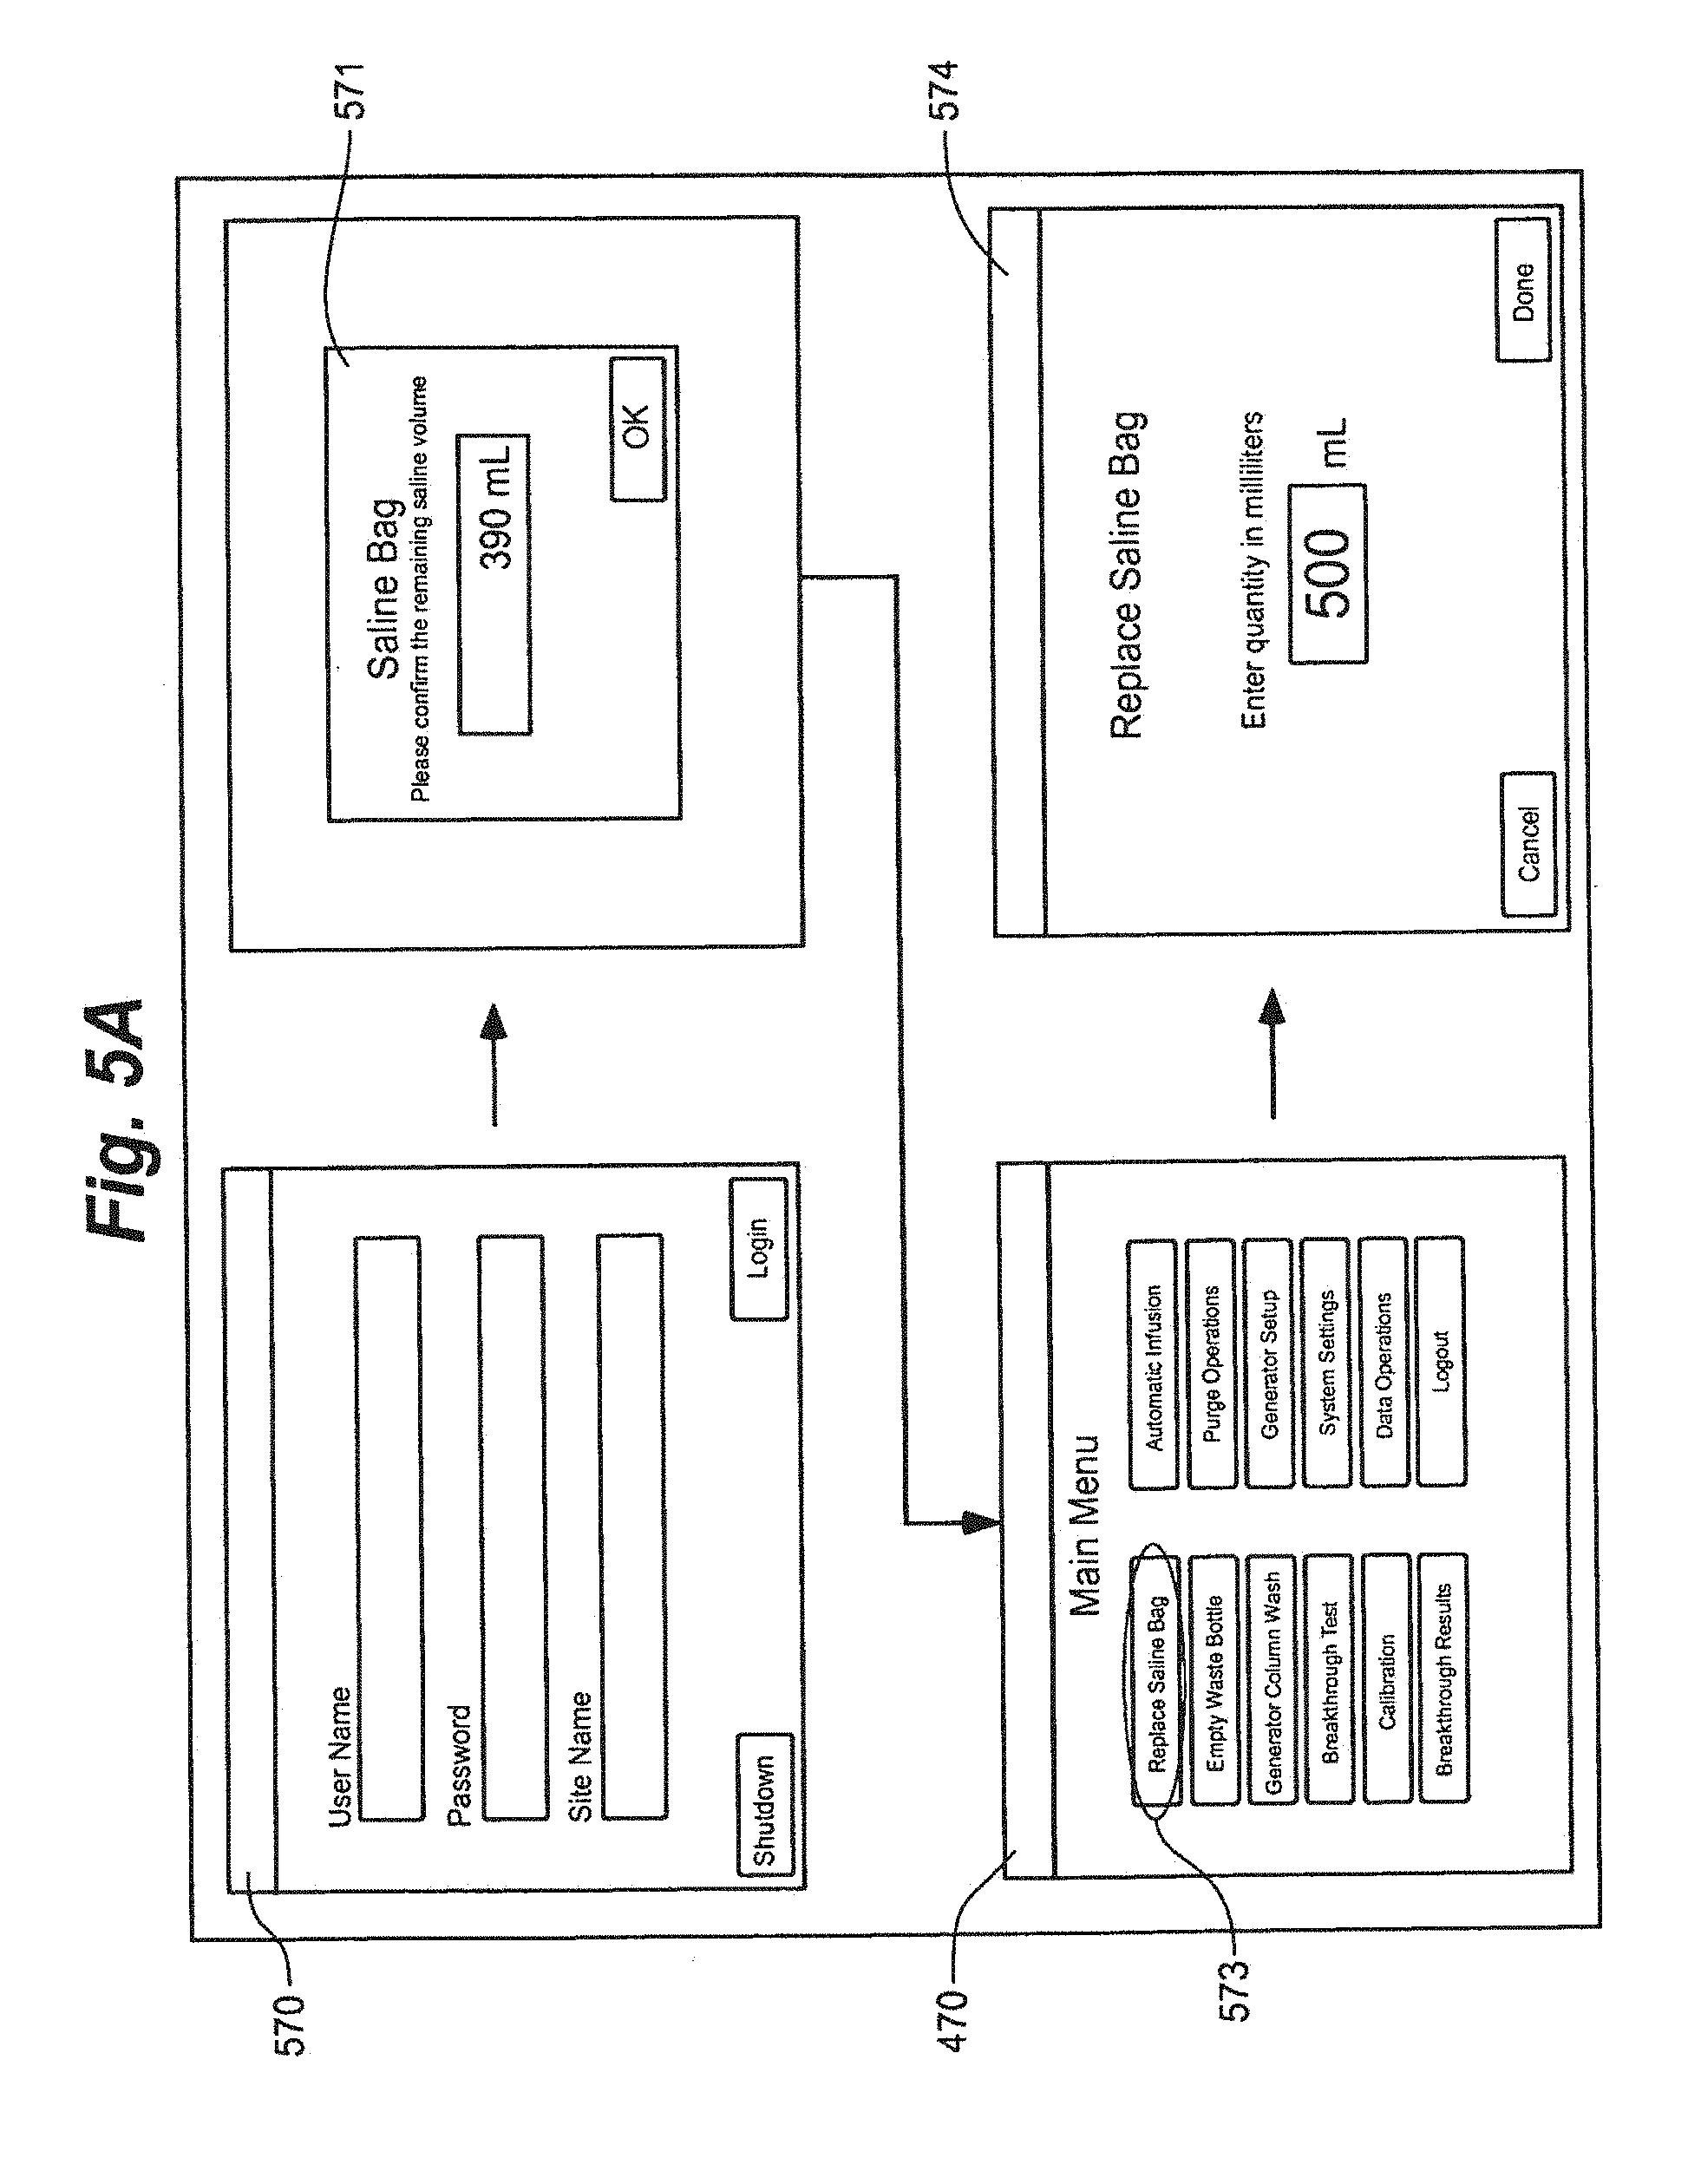 Patent Us 9717844 B2 Electric Circuit Board Mri Baler 0 Petitions